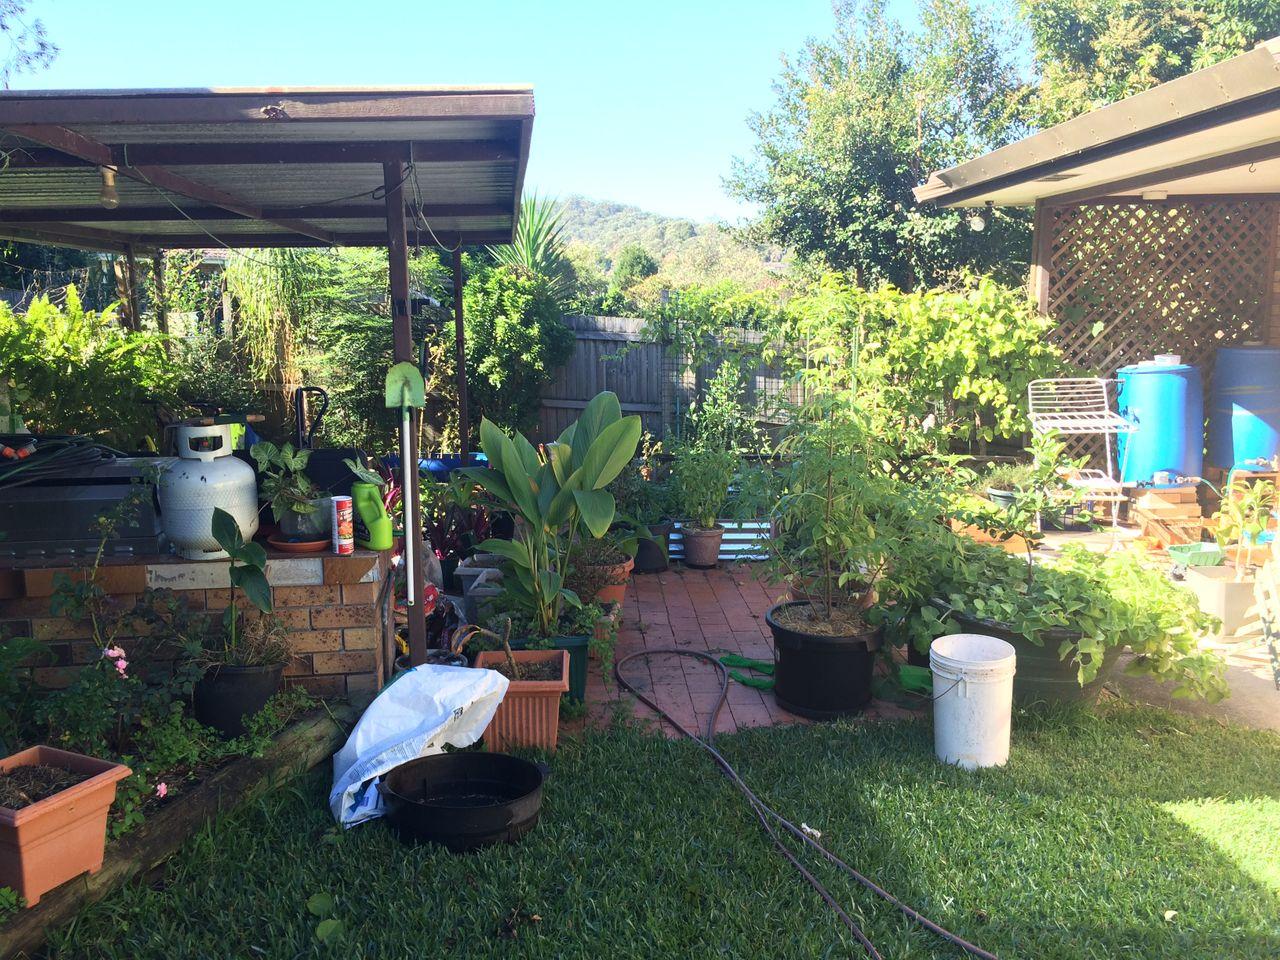 The old backyard